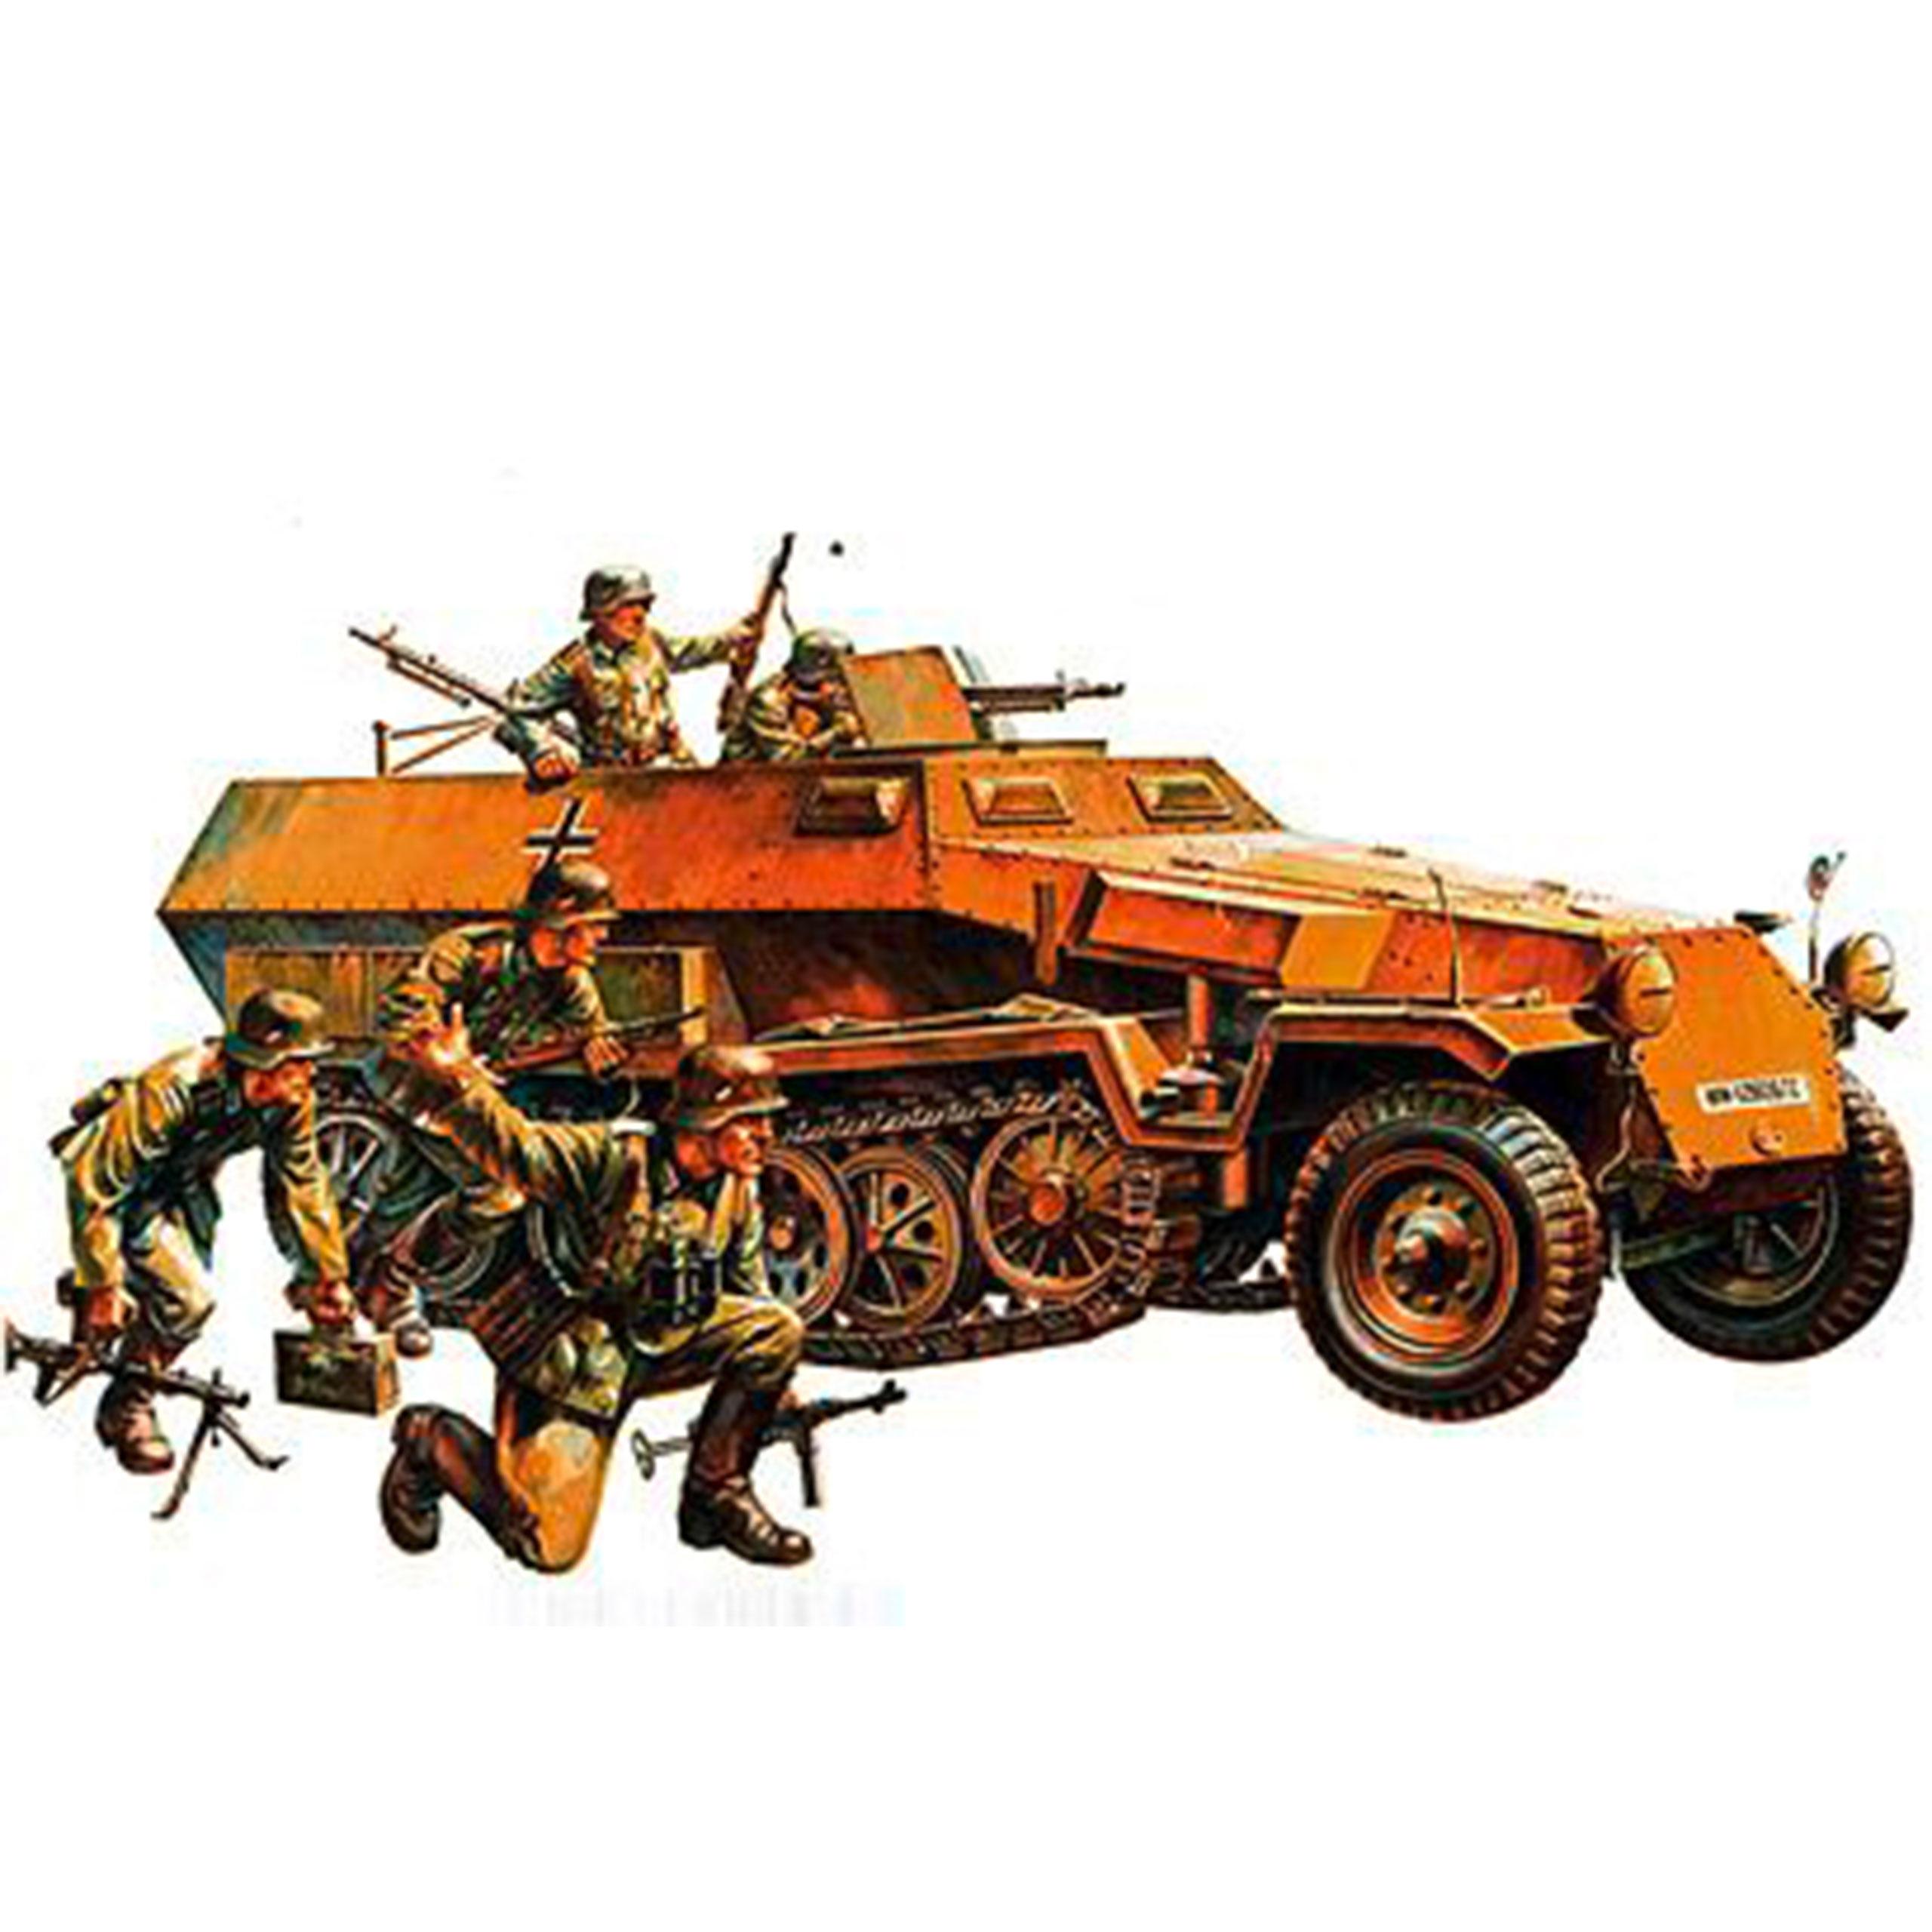 Tamiya 1:35 WWII Sonderkfz. 251/1 Hanomag Halbkettenfahrzeug 300035020